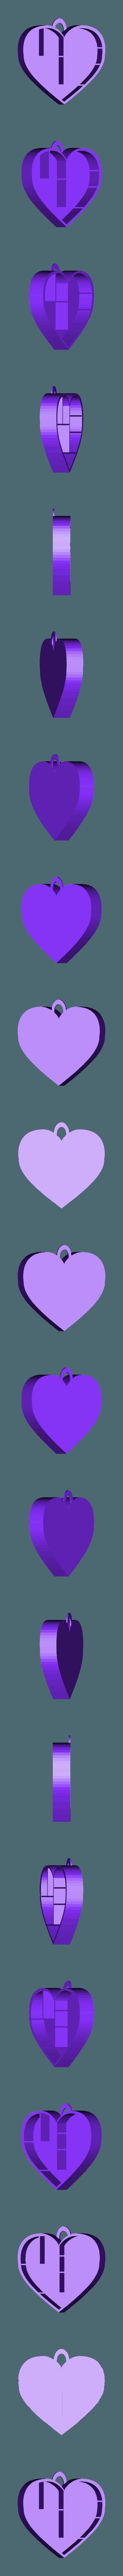 etagére coeur avec accroche 10x10.stl Download STL file Heart shelf • 3D printing model, catf3d